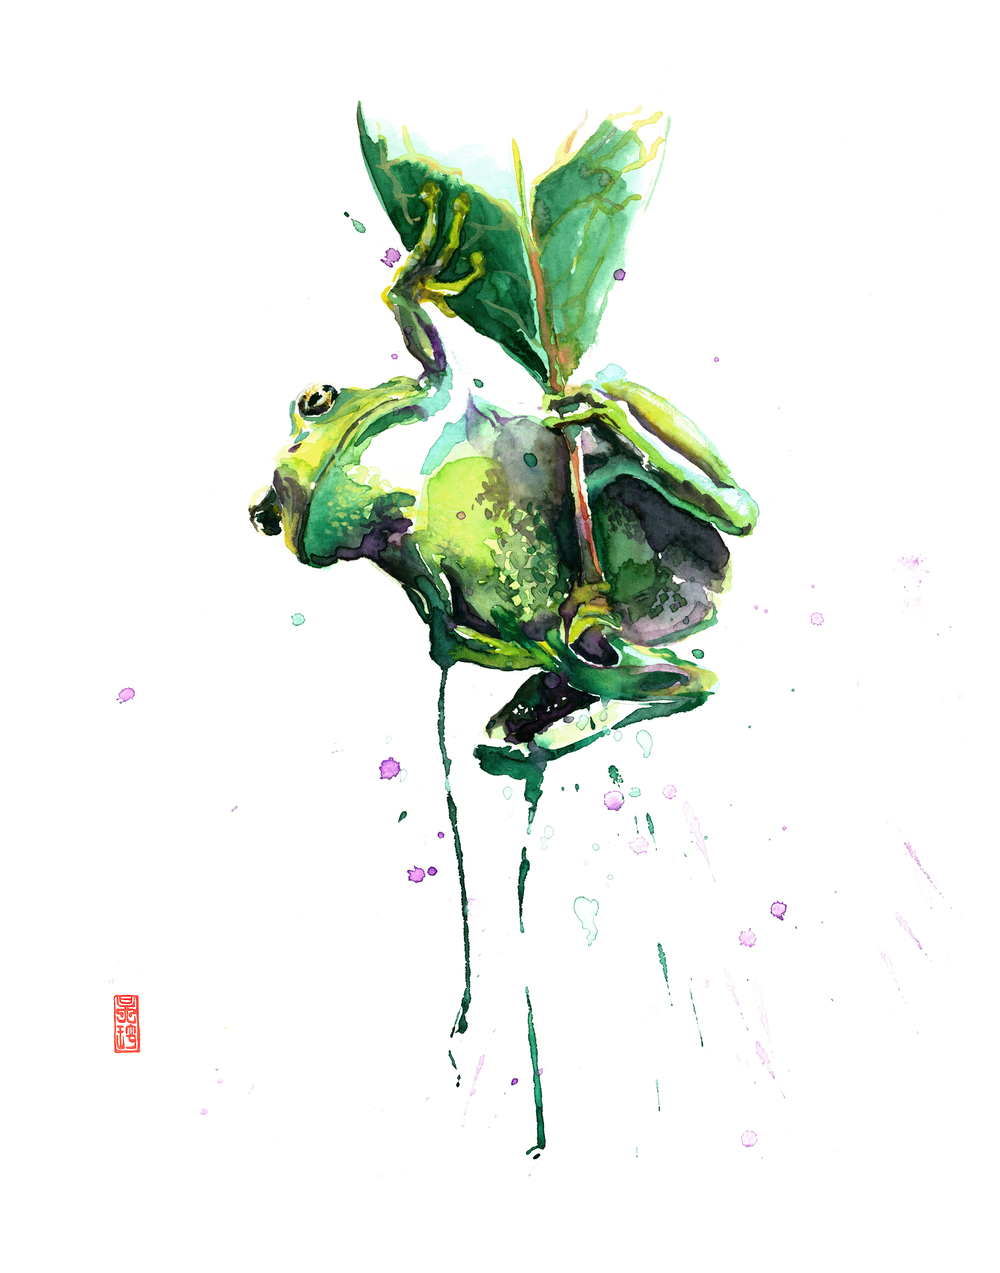 Tree frog 8x10.jpg